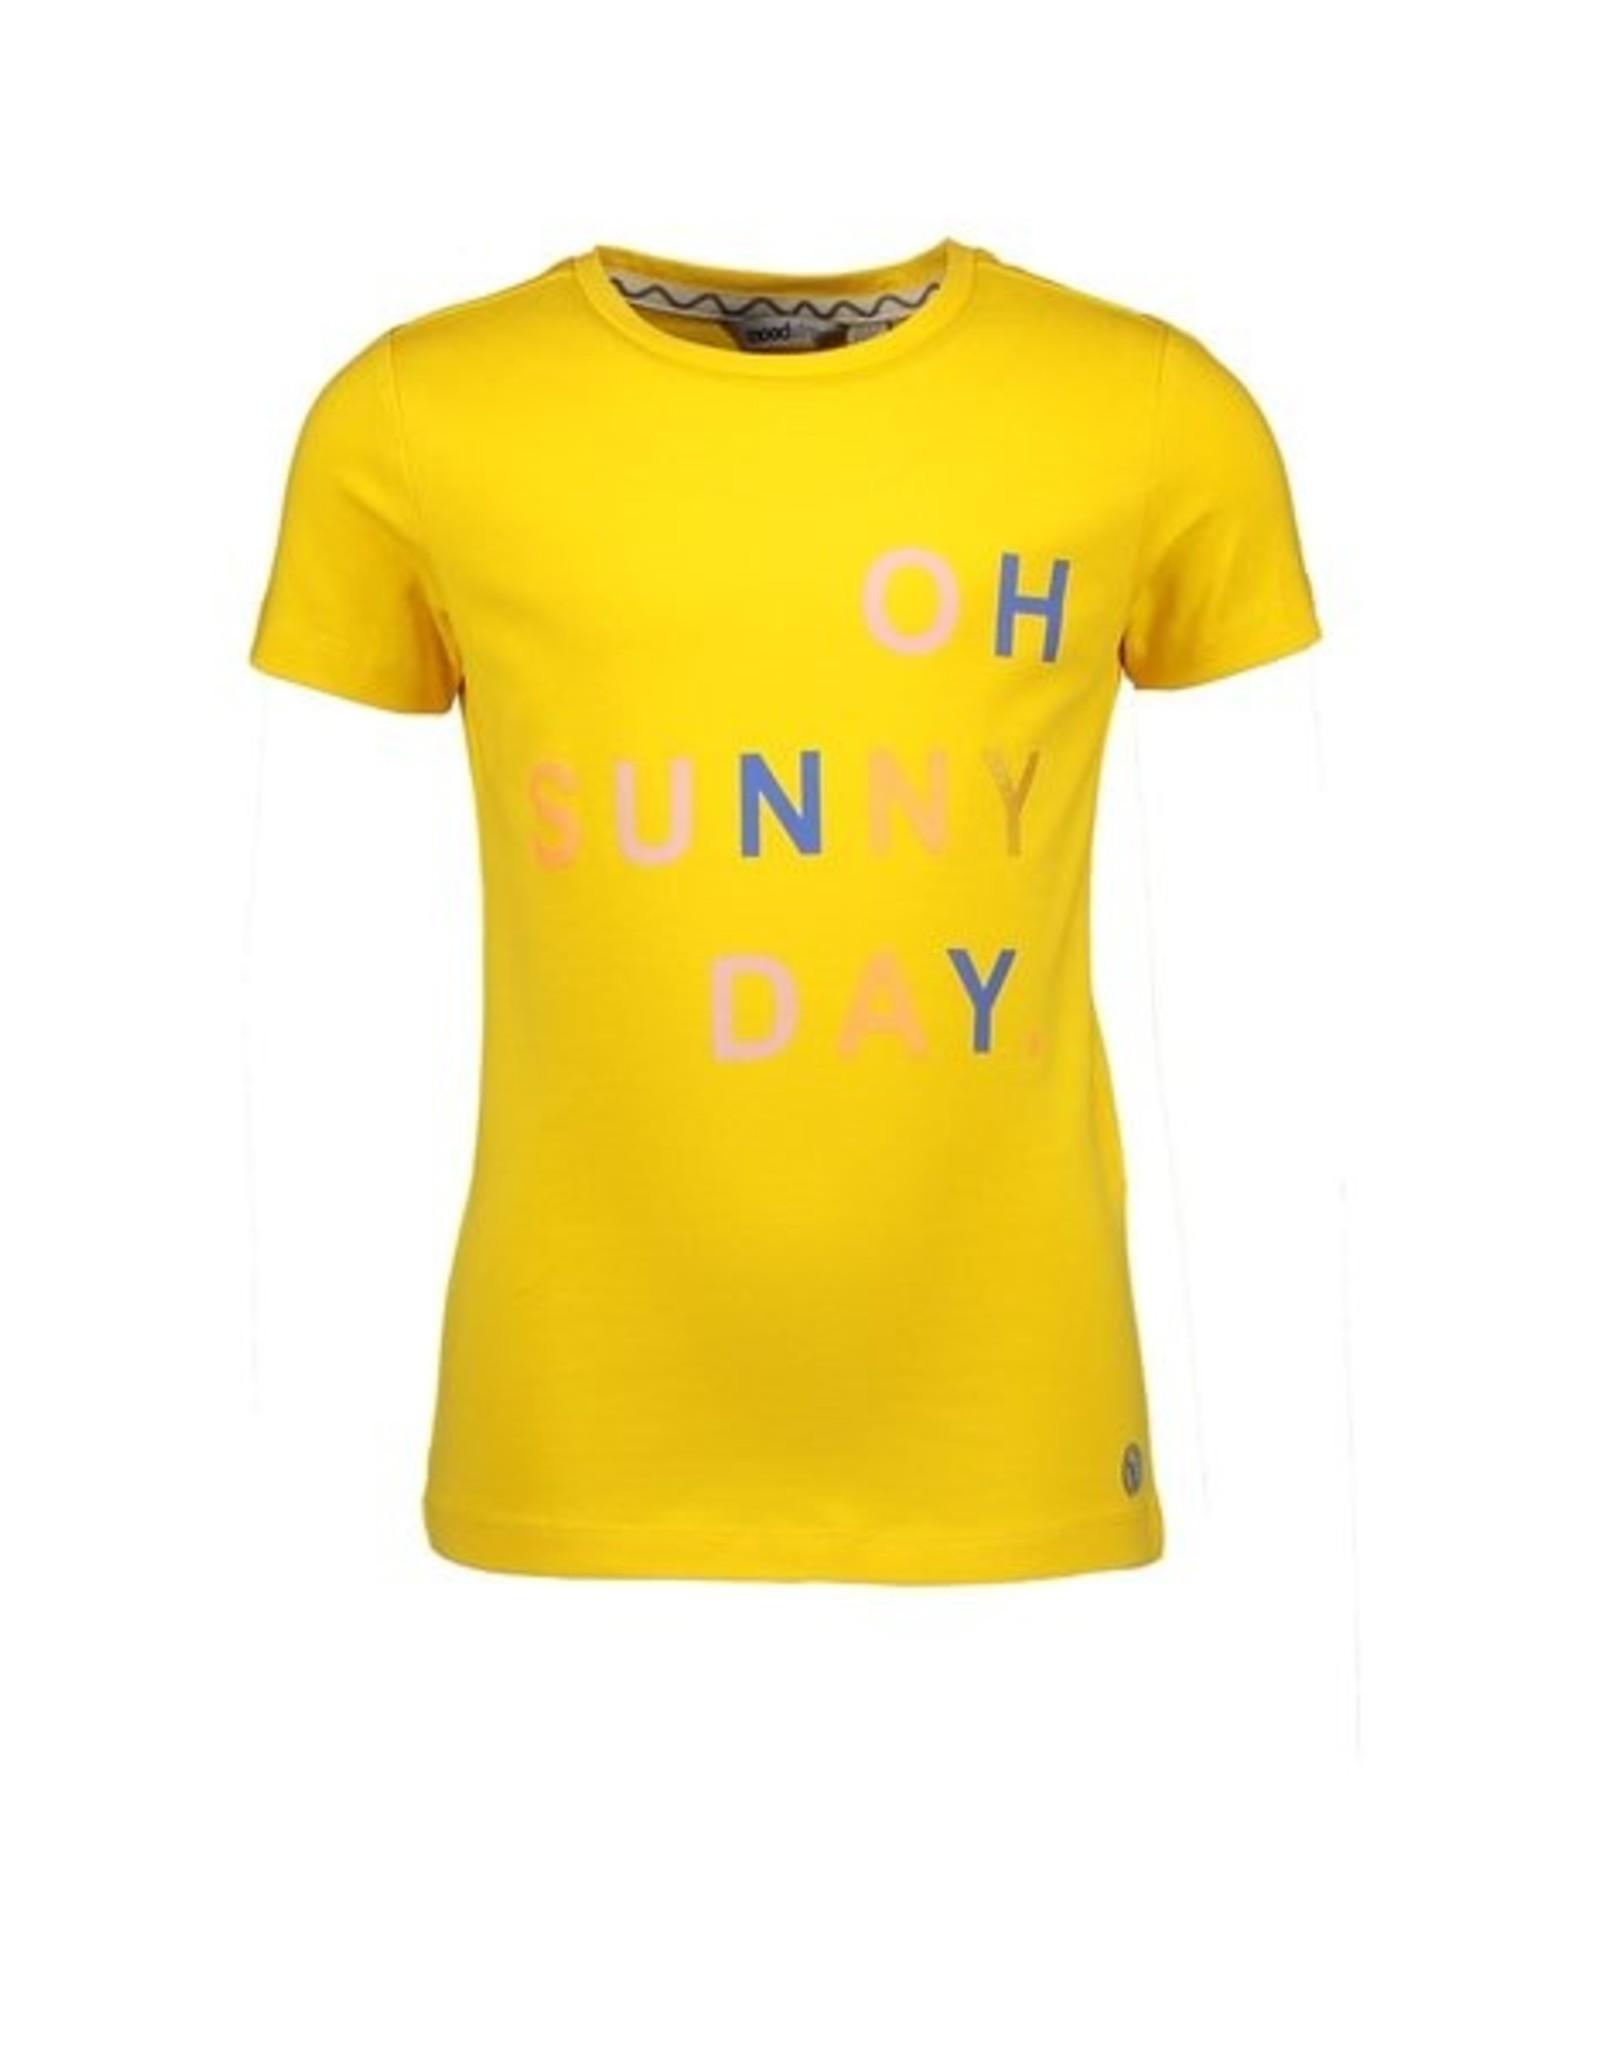 Moodstreet Moodstreet shirt 5400 yellow